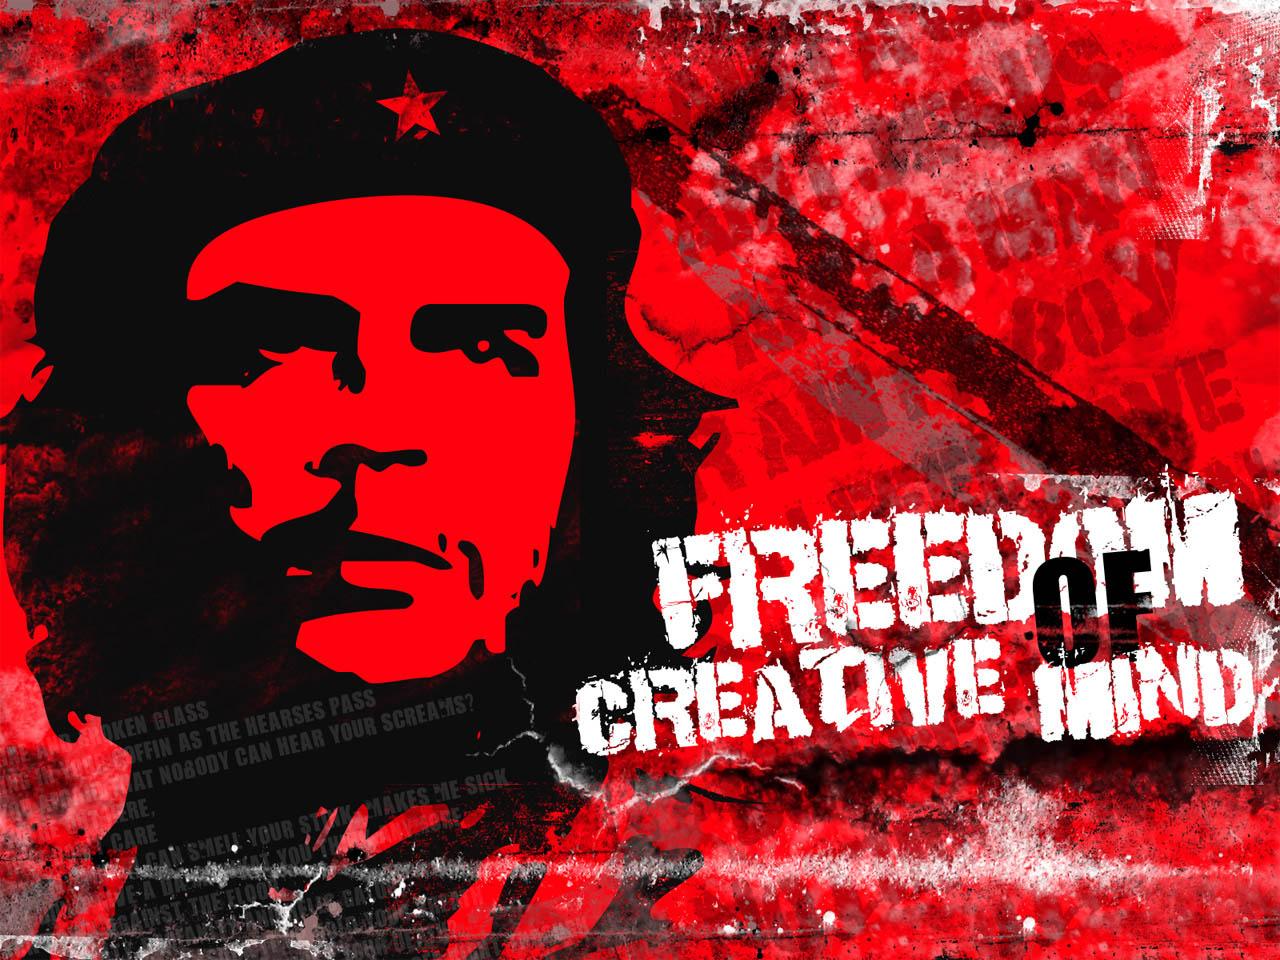 http://4.bp.blogspot.com/-PXGzUih_Dl8/Txuus9PXQcI/AAAAAAAAORc/YocFyi1jBH0/s1600/Che-Guevara-Wallpapers-2010-4.jpg